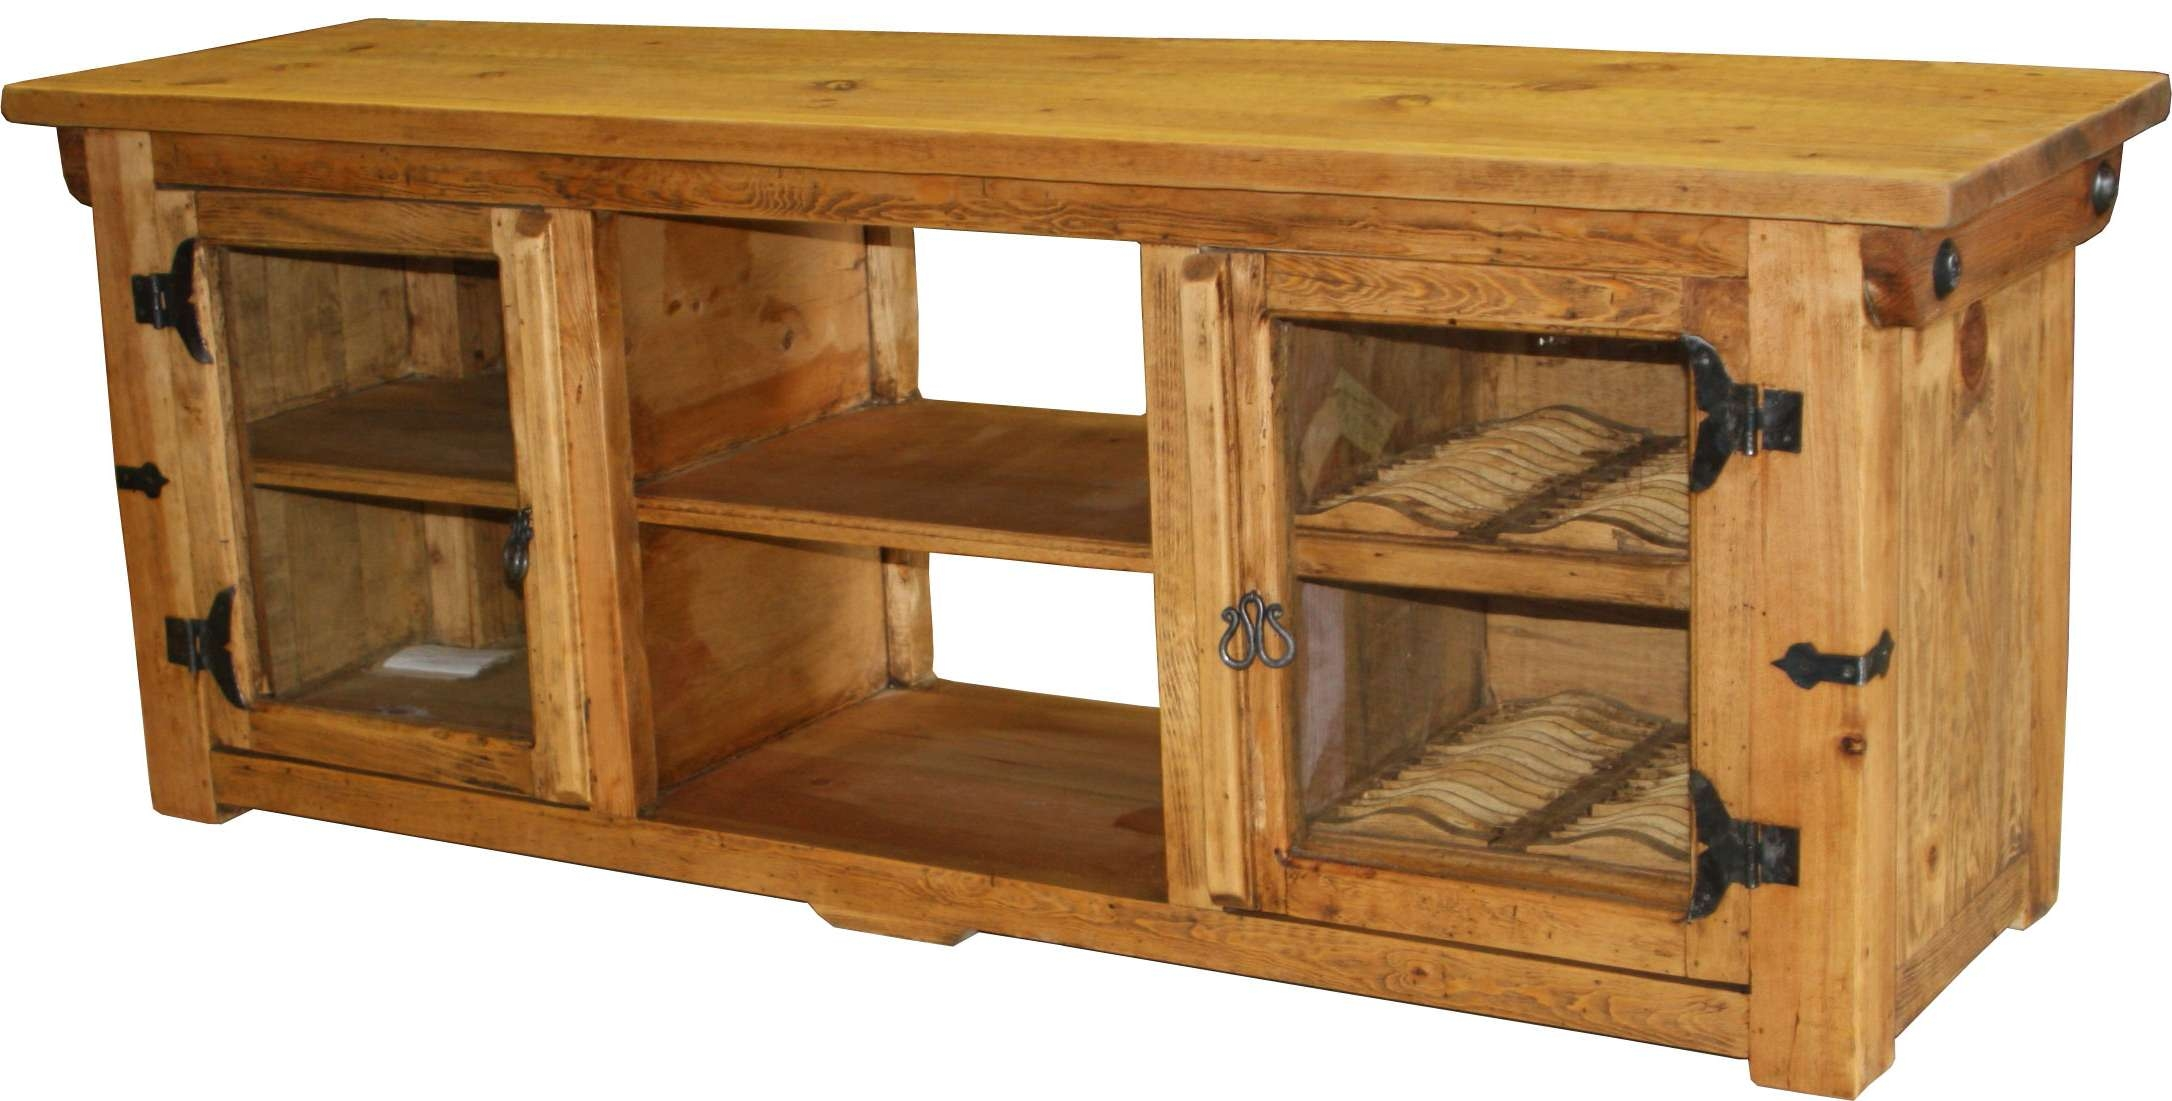 Lauro Tv Stand @ Durango Trail Rustic Furniture In Rustic Furniture Tv Stands (View 4 of 20)